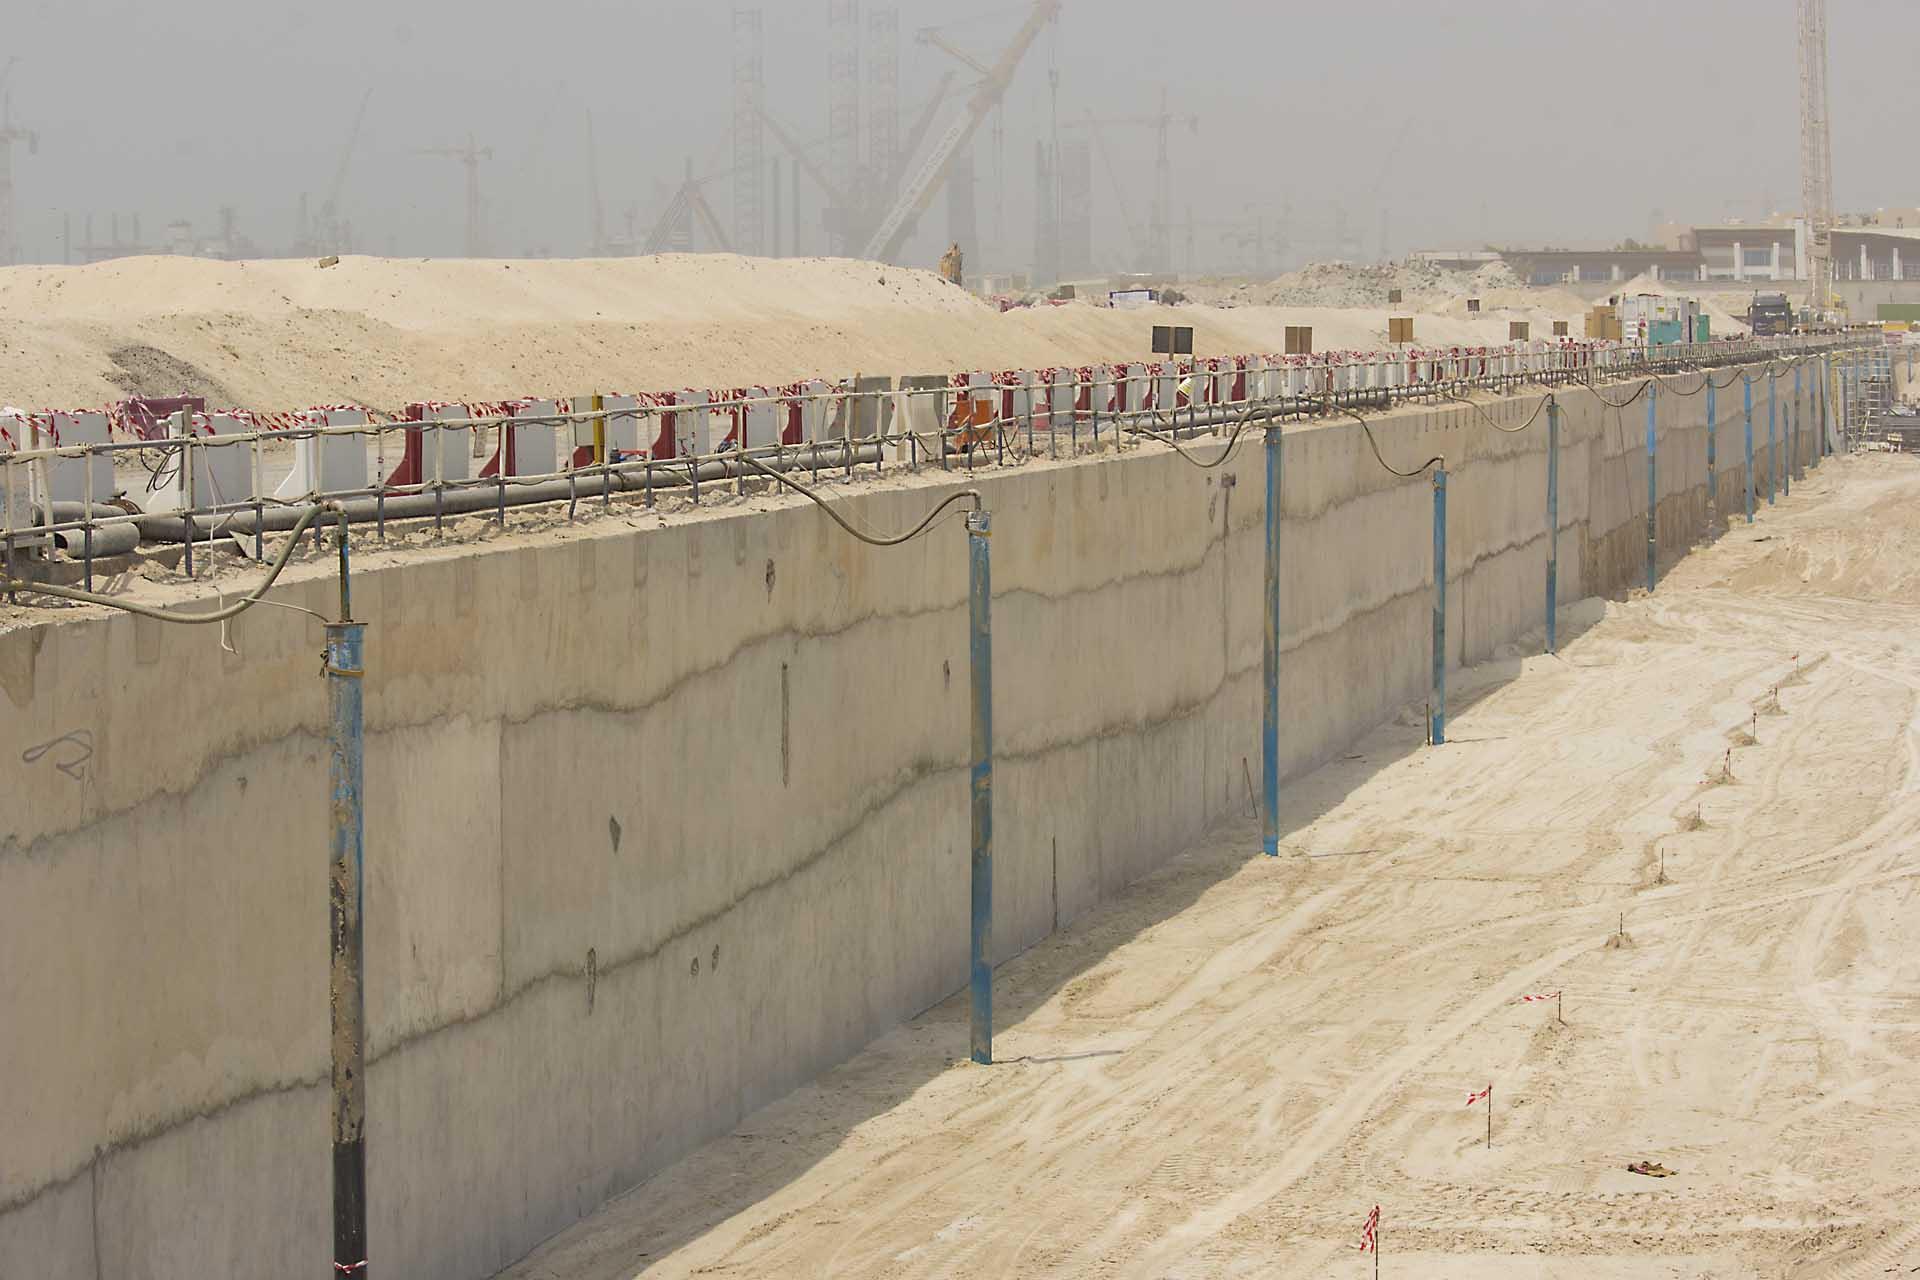 La Mer, Jumeirah Open Beach car park dewatering